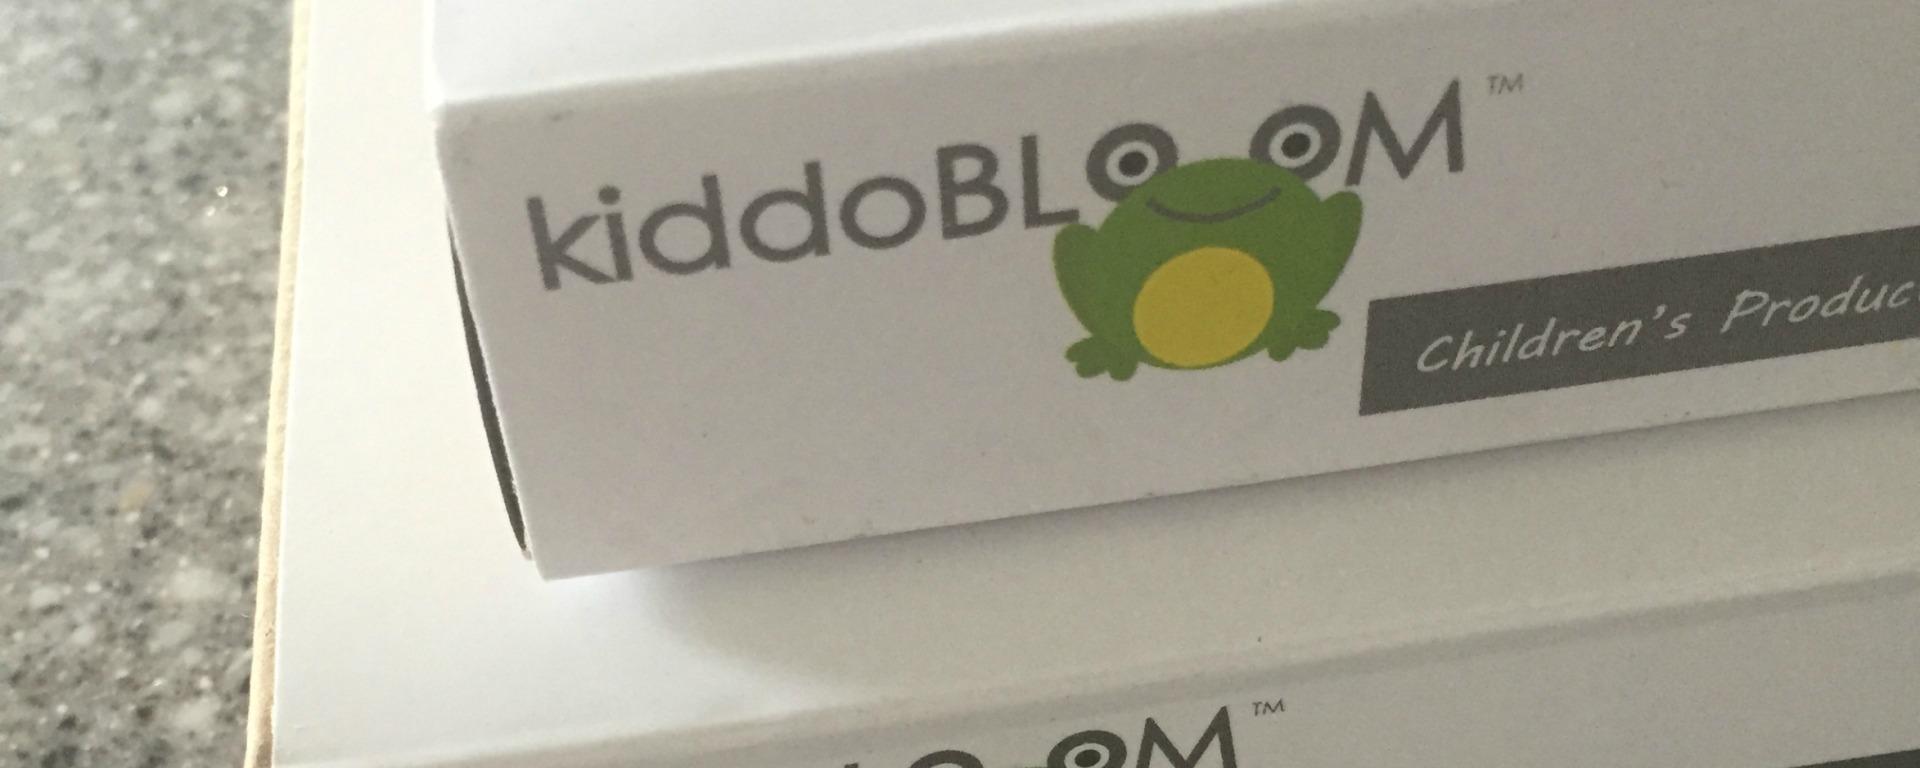 Kiddobloom toddler baby spoon